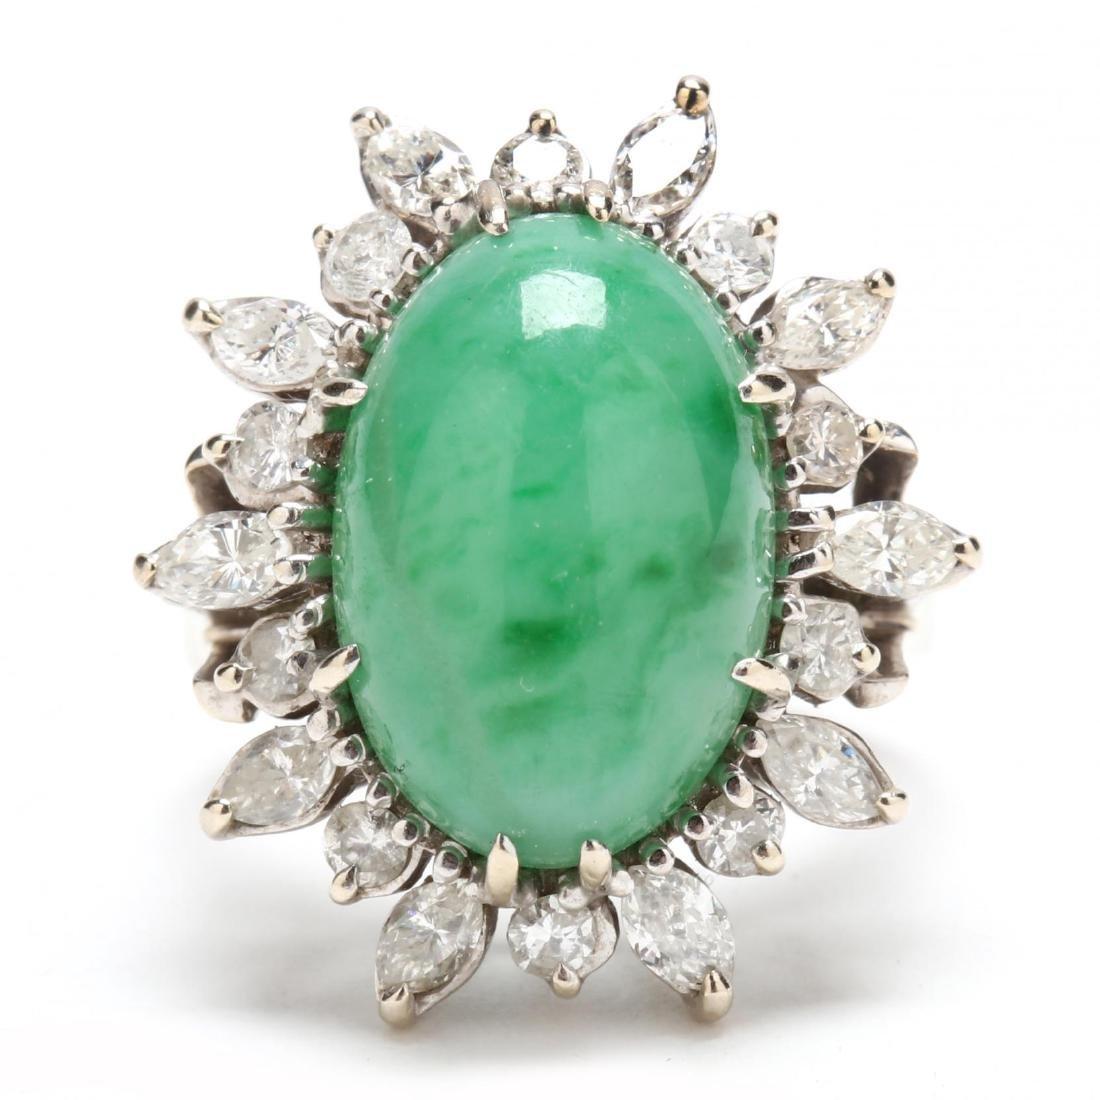 18KT White Gold, Jadeite, and Diamond Ring